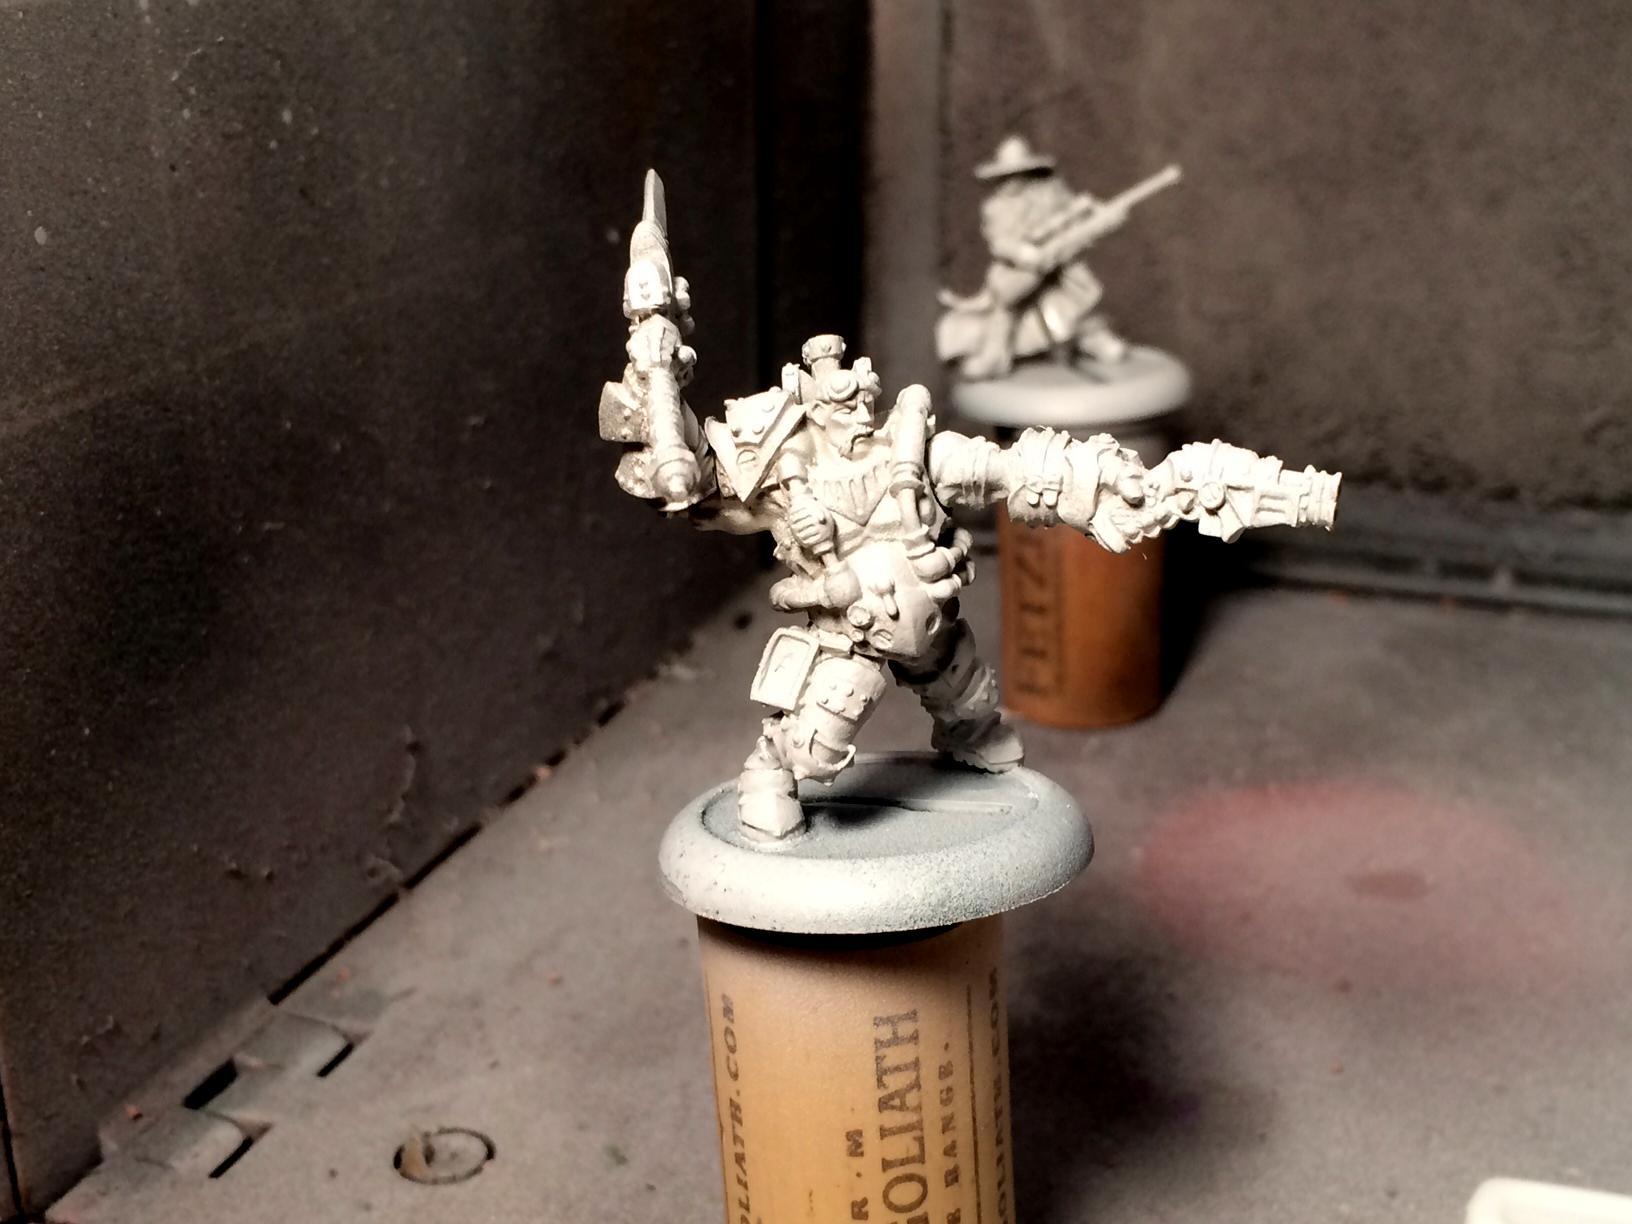 Macbain, Mercenary, Privateer Press, Warcaster, Warmachine